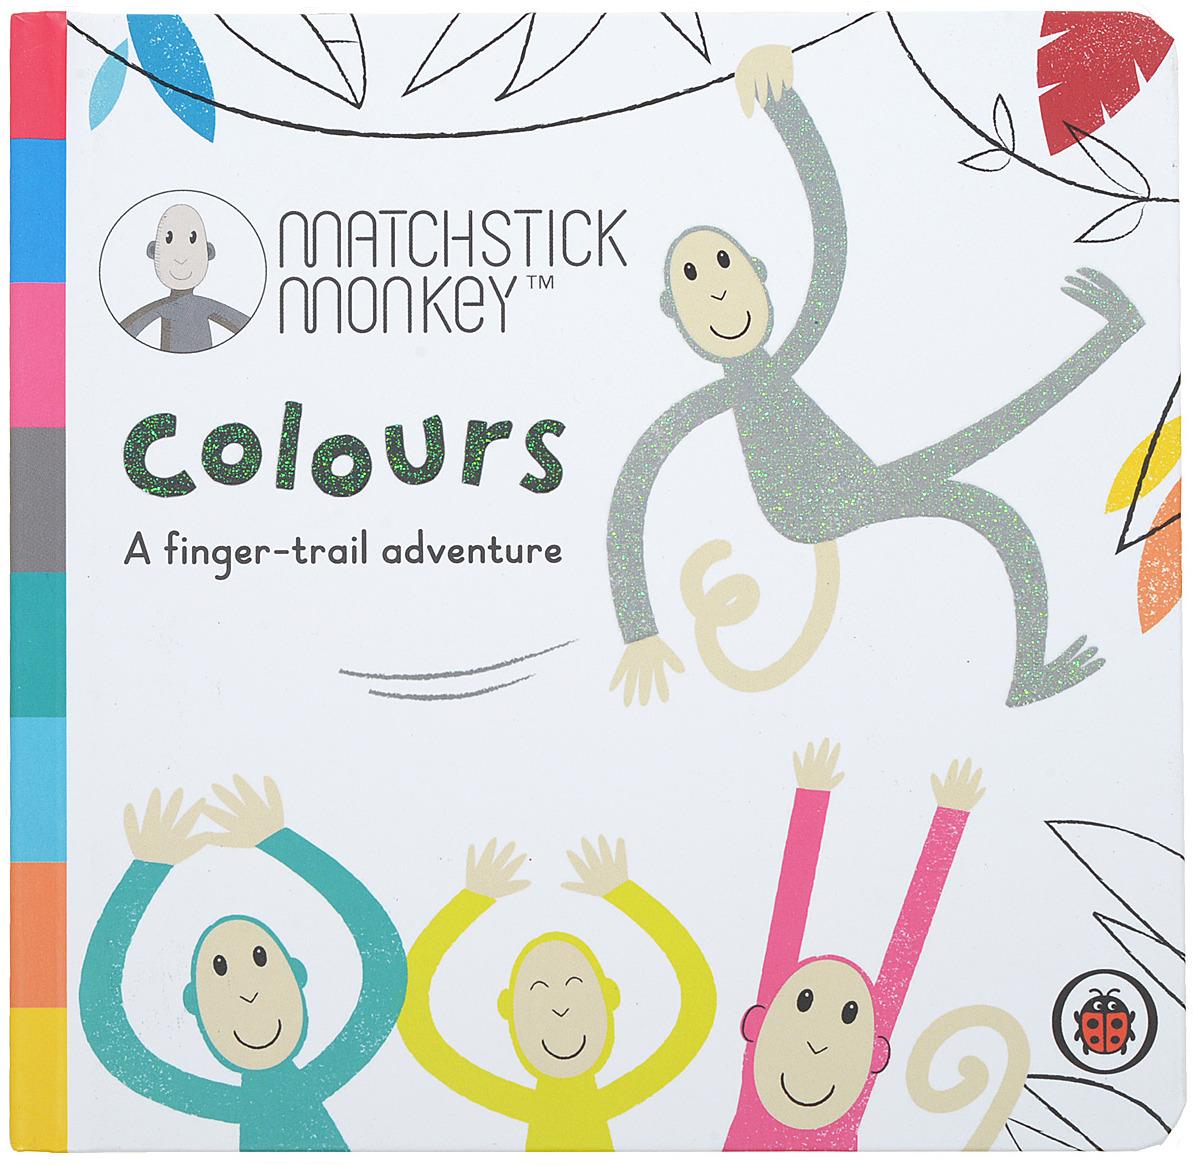 Matchstick Monkey: Colours knl hobby dragon ball led desk lamp explosion models hand the monkey king eye blaster led creative birthday gift free shipping